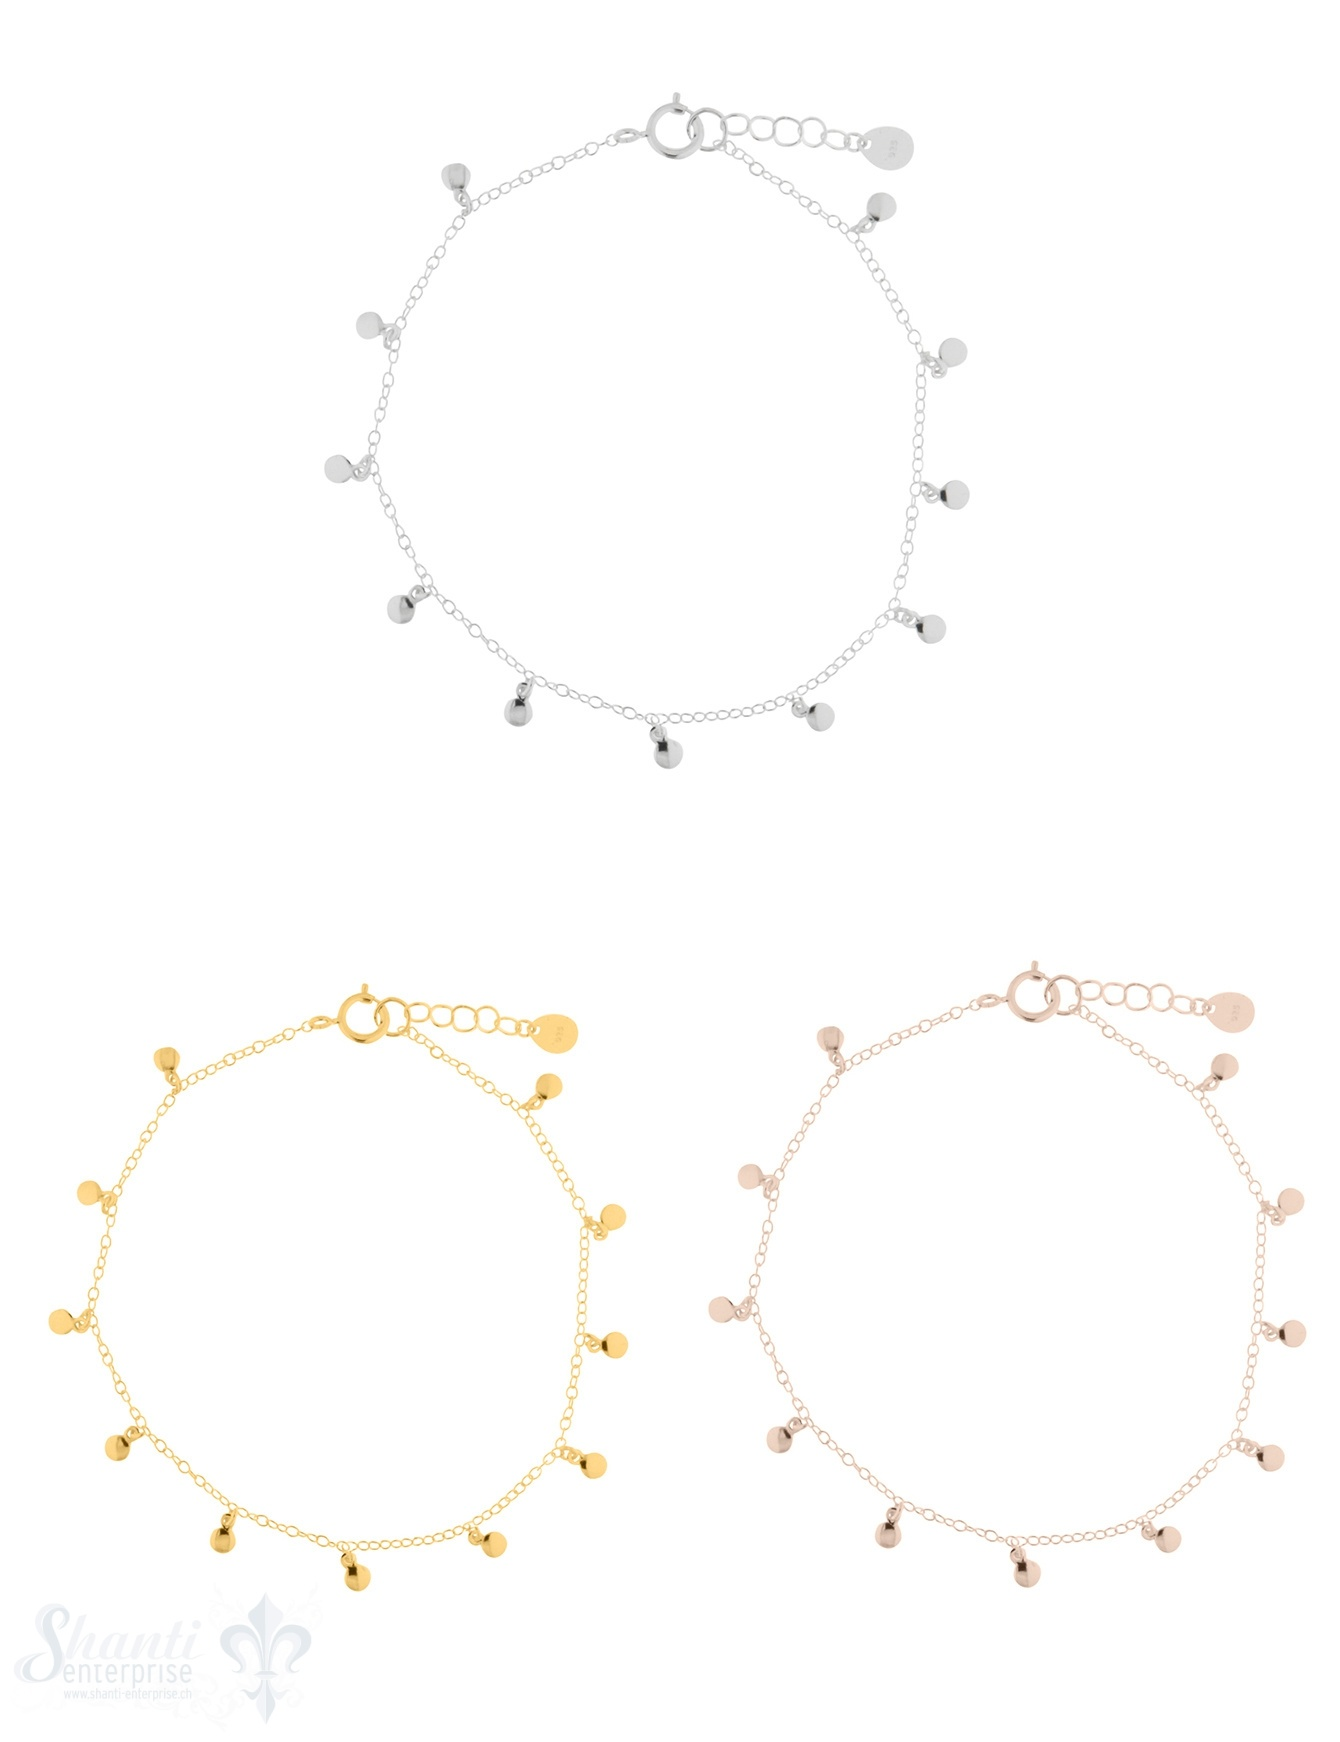 Armkette Silber Anker fein mit Mini-Plaquetten